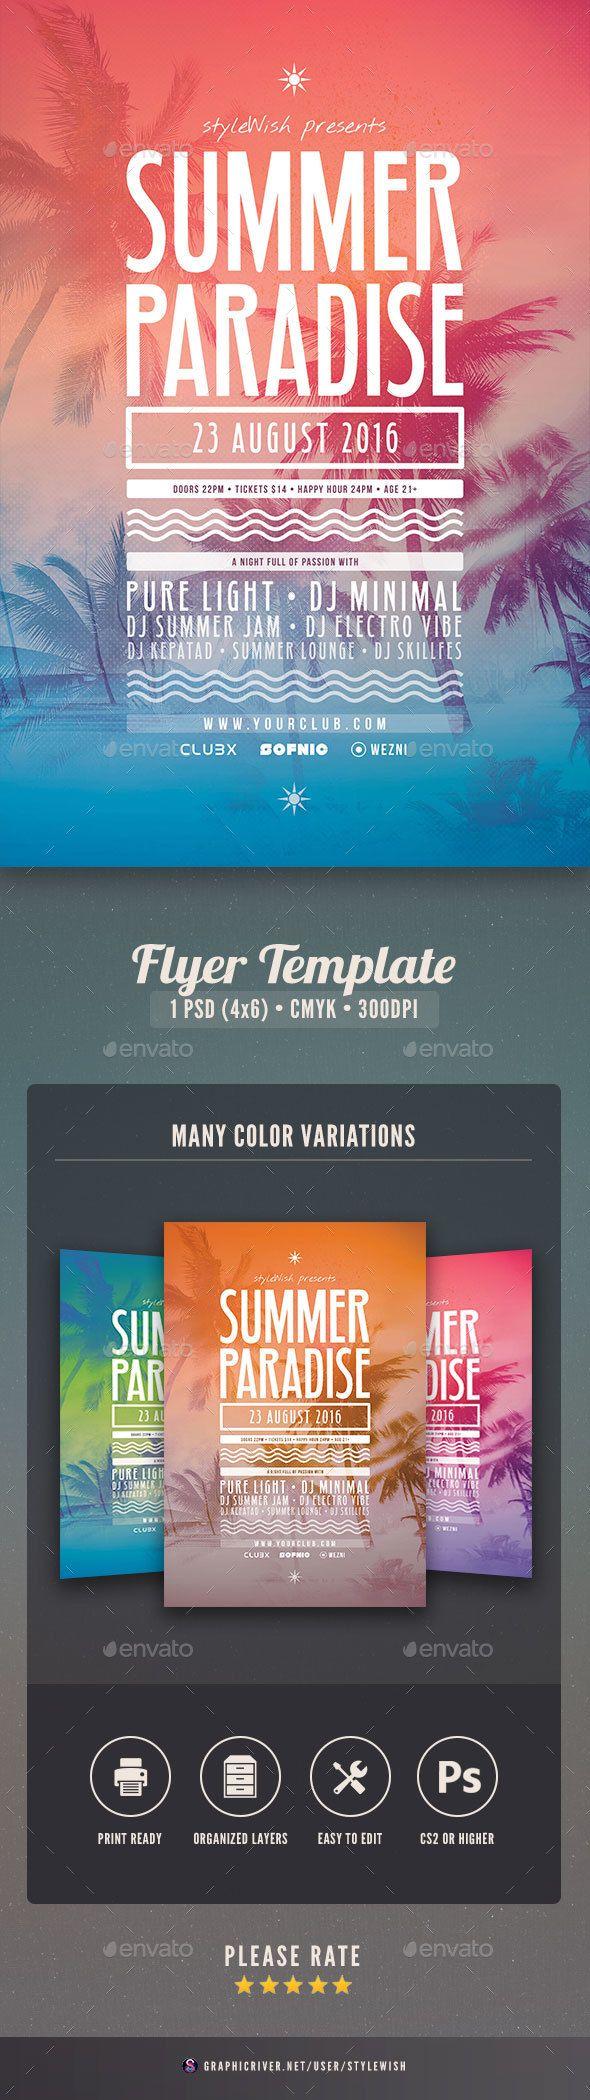 25 best ideas about Event Flyers – Azure Flyer Template